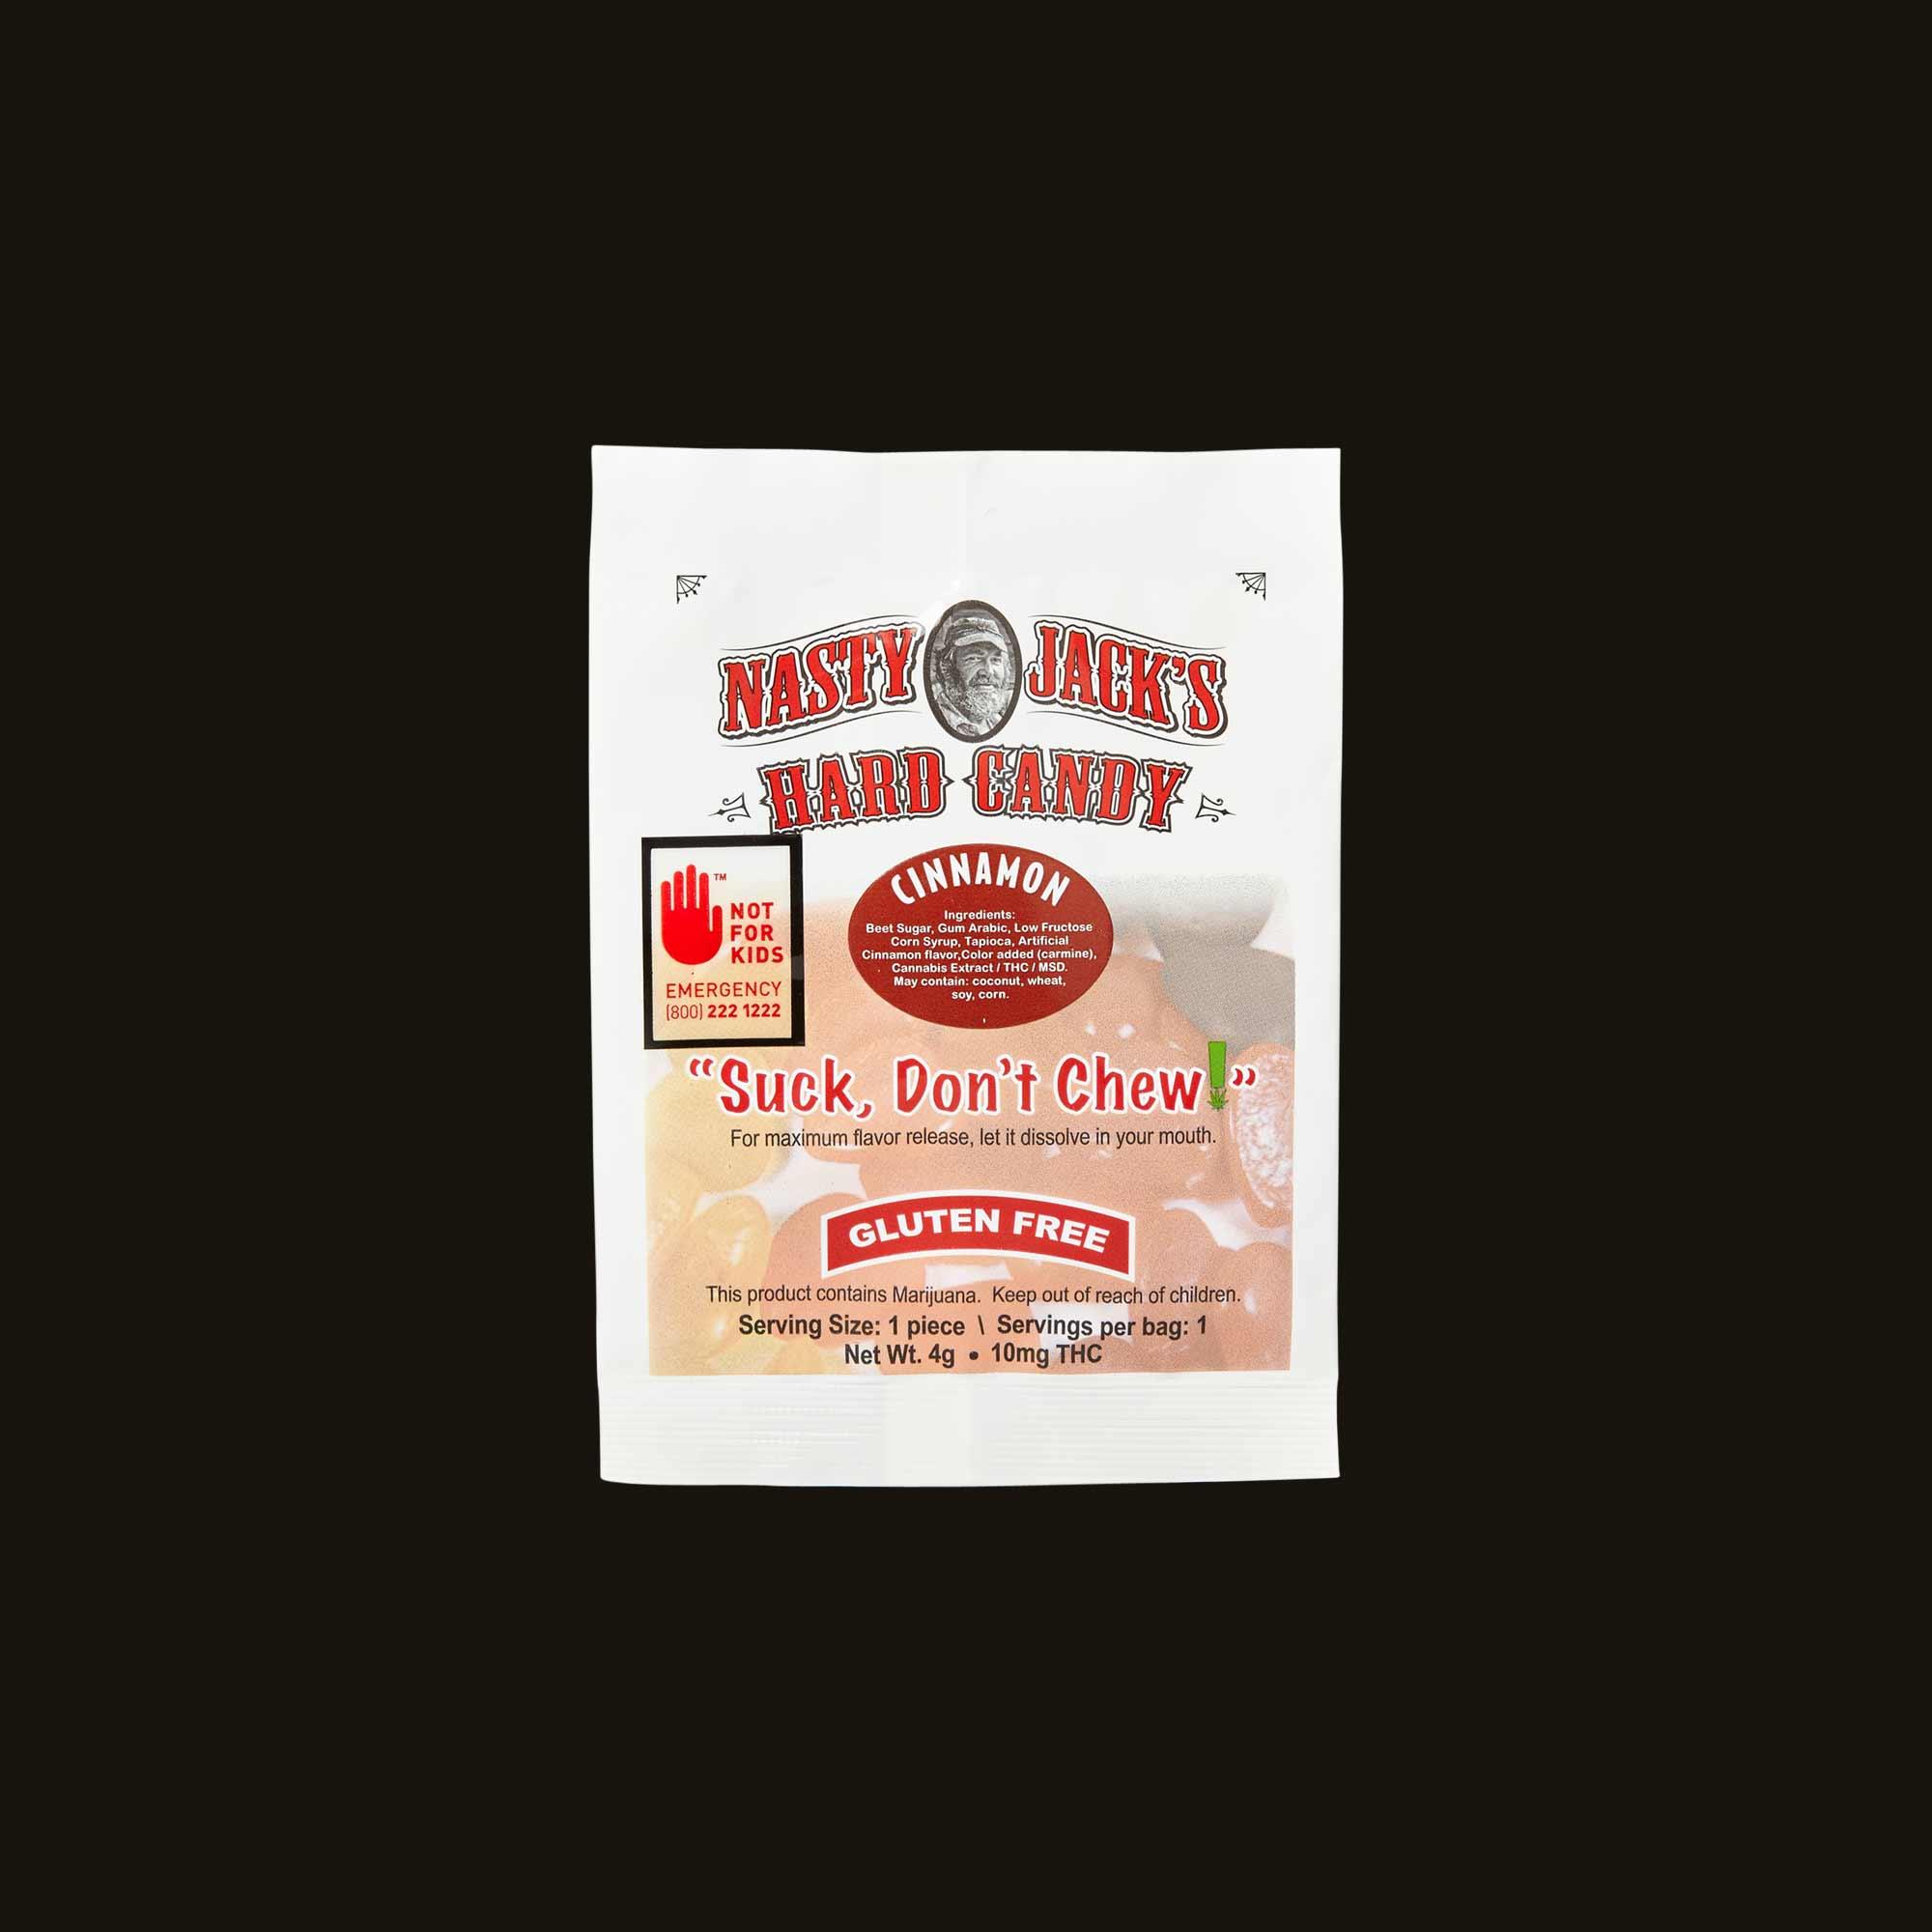 Nasty Jack's Cinnamon Hard Candy